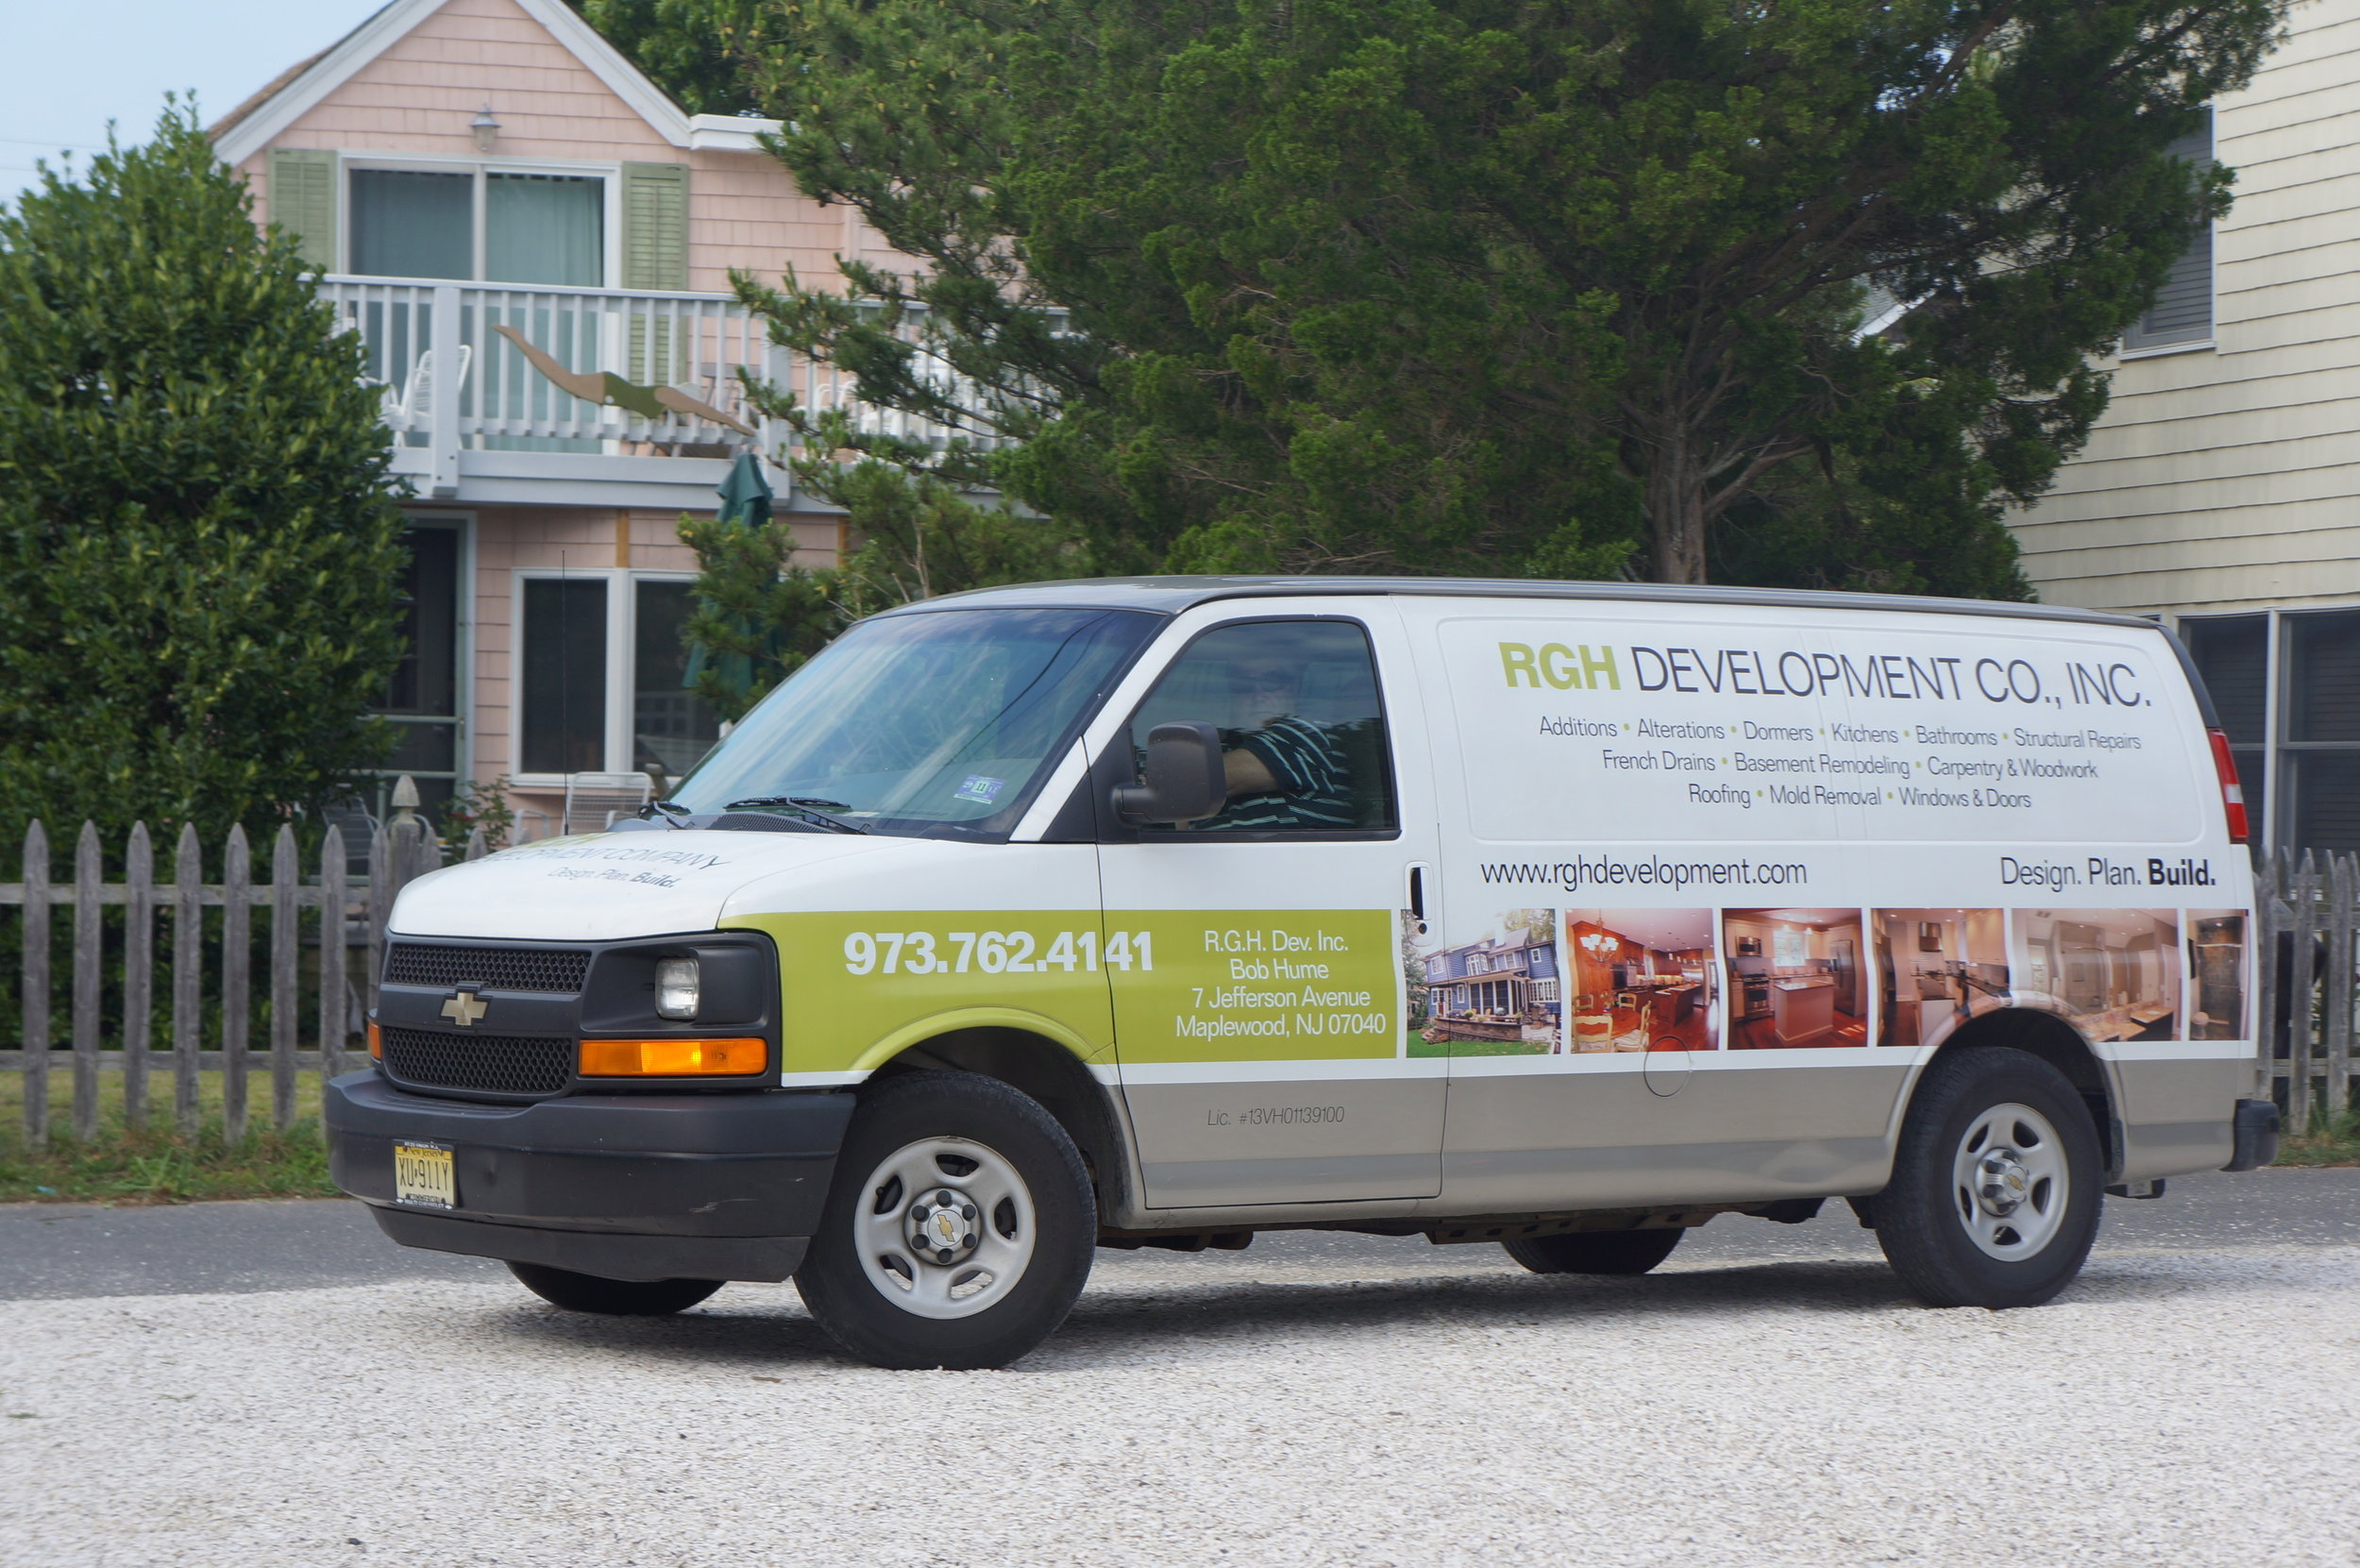 RGH Development Company and Bob Hume's truck